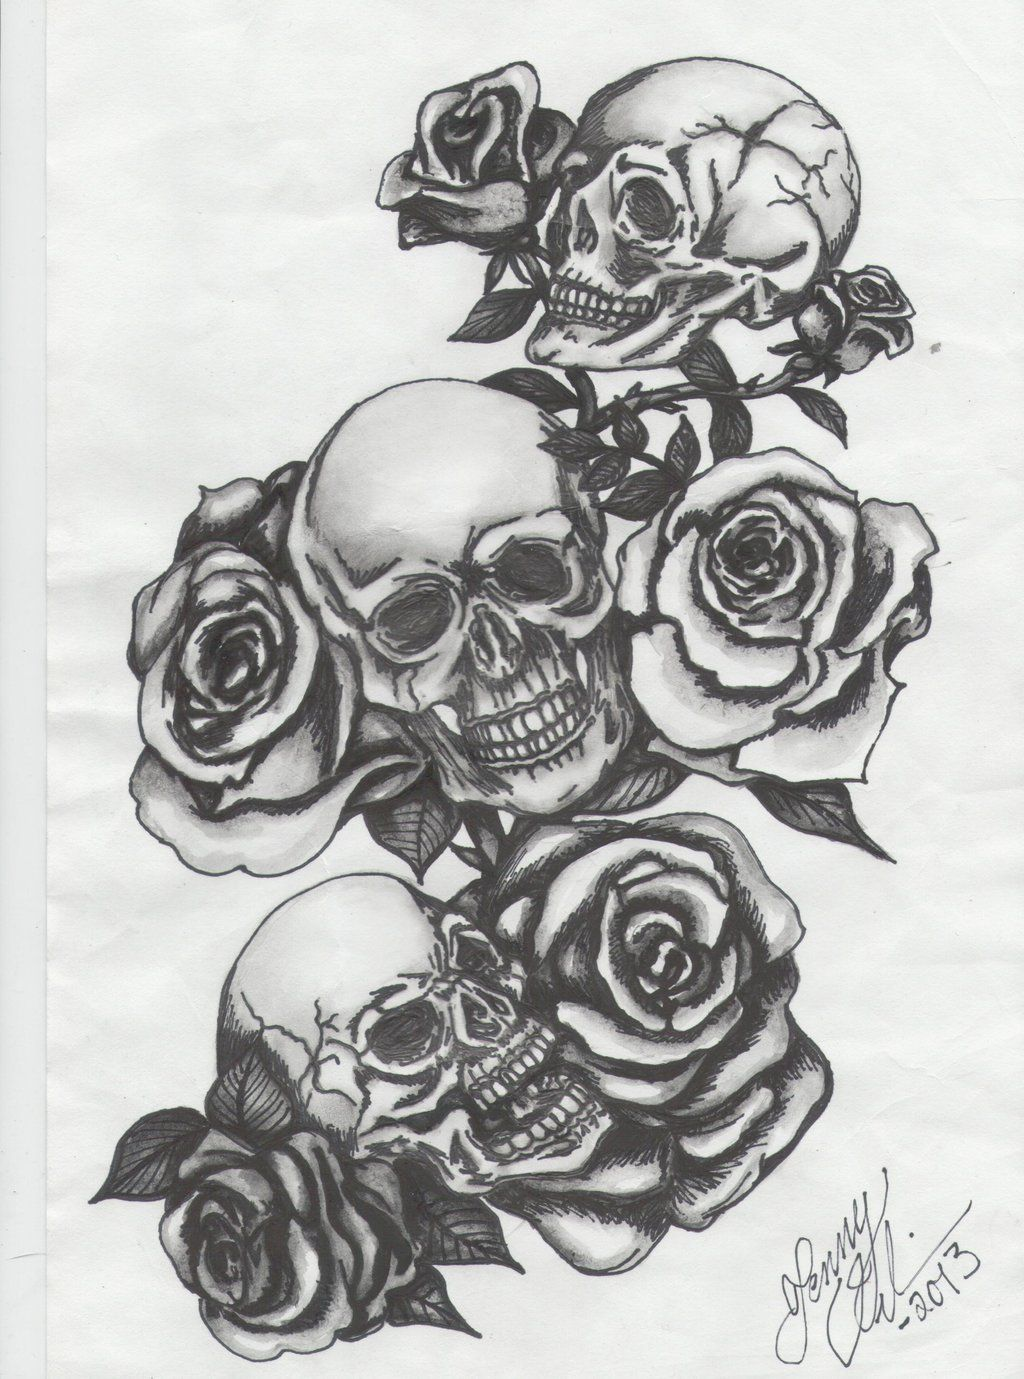 New Ideas For Tattoo Design Skull Rose Tattoos Tattoos Rose Tattoo Sleeve